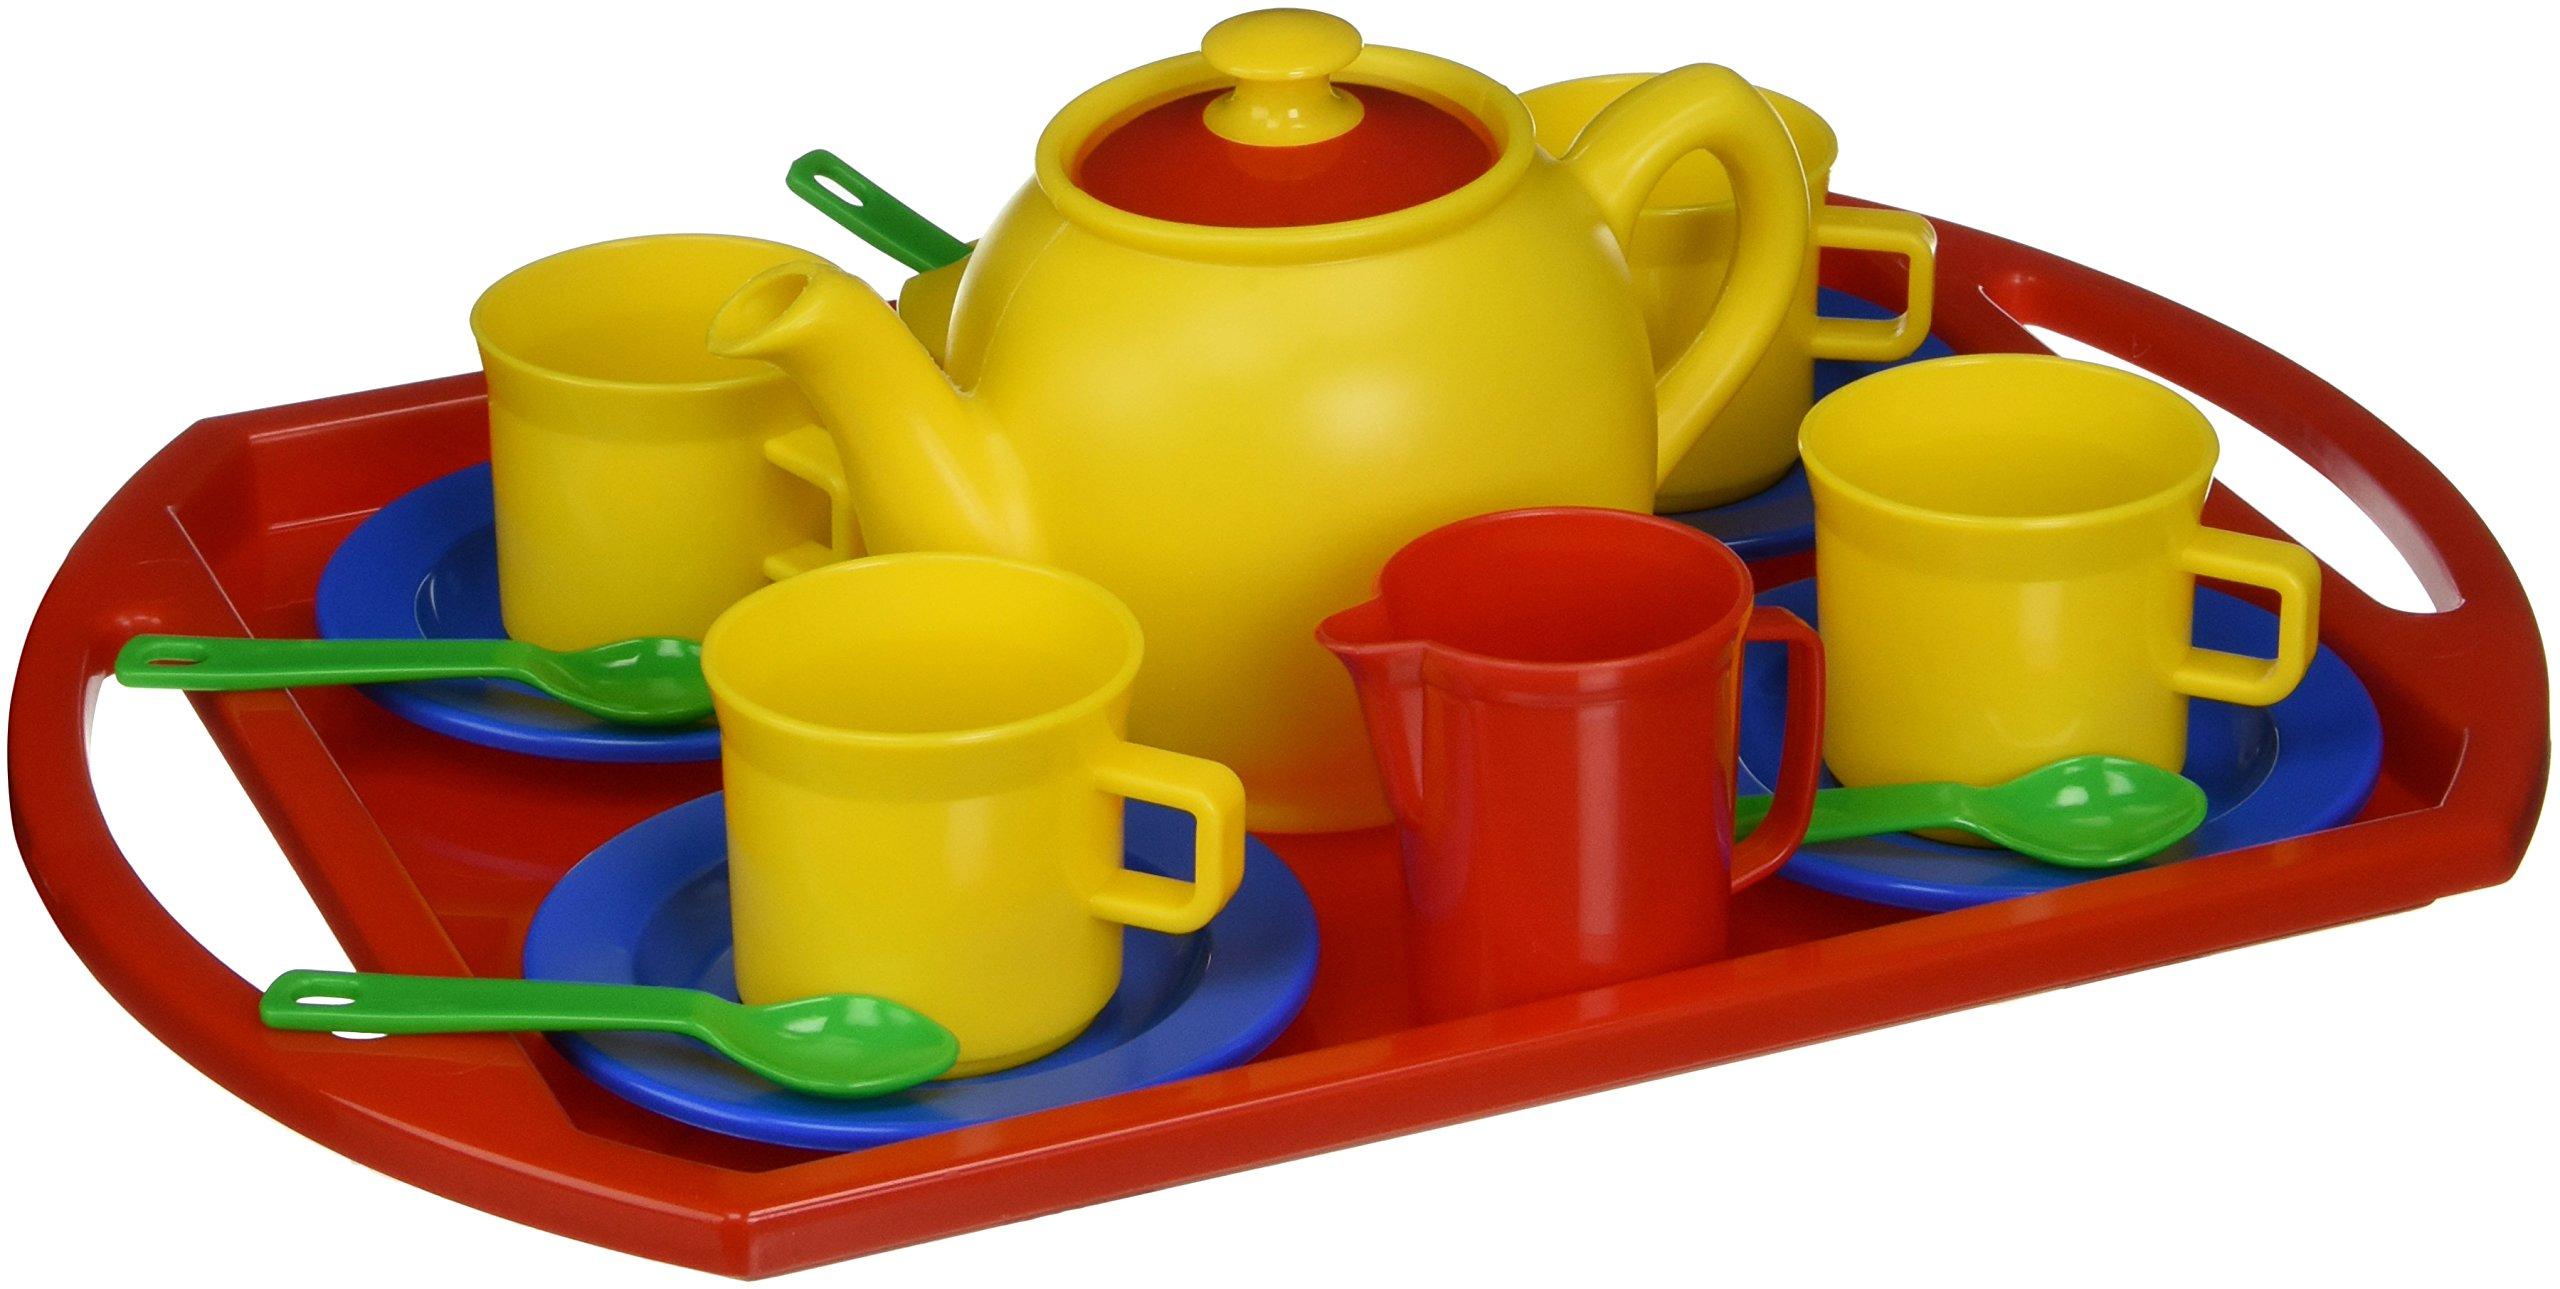 Dantoy Plastic Tea Service for 4 Playset - 250623